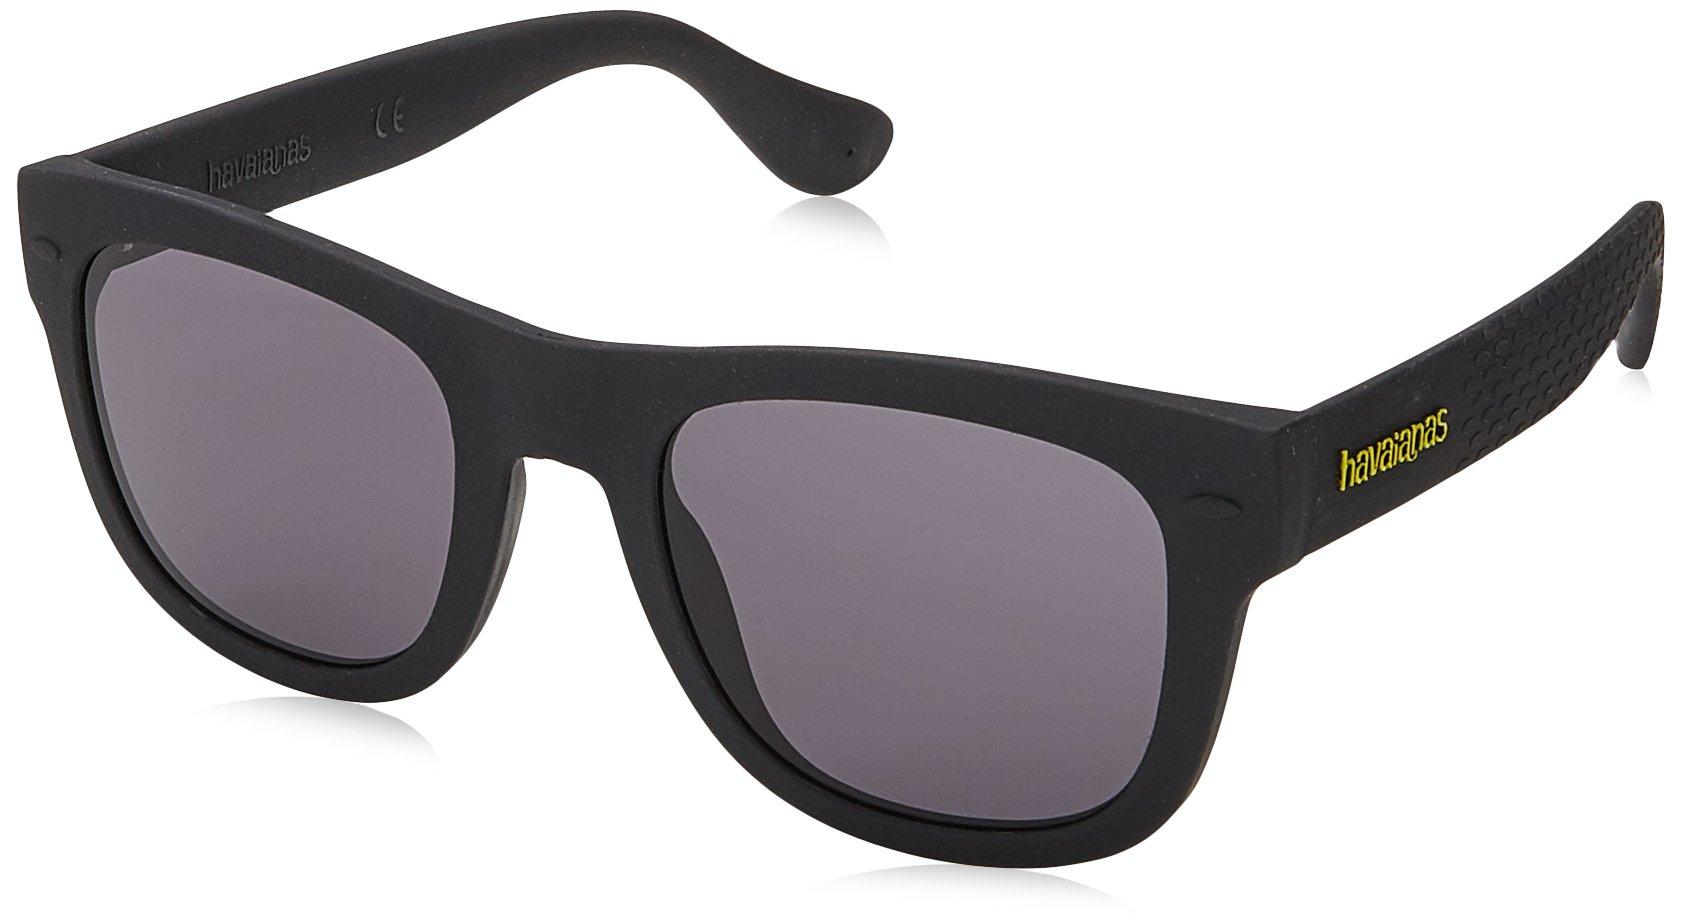 Havaianas Paraty/l Square Sunglasses, Black, 52 mm